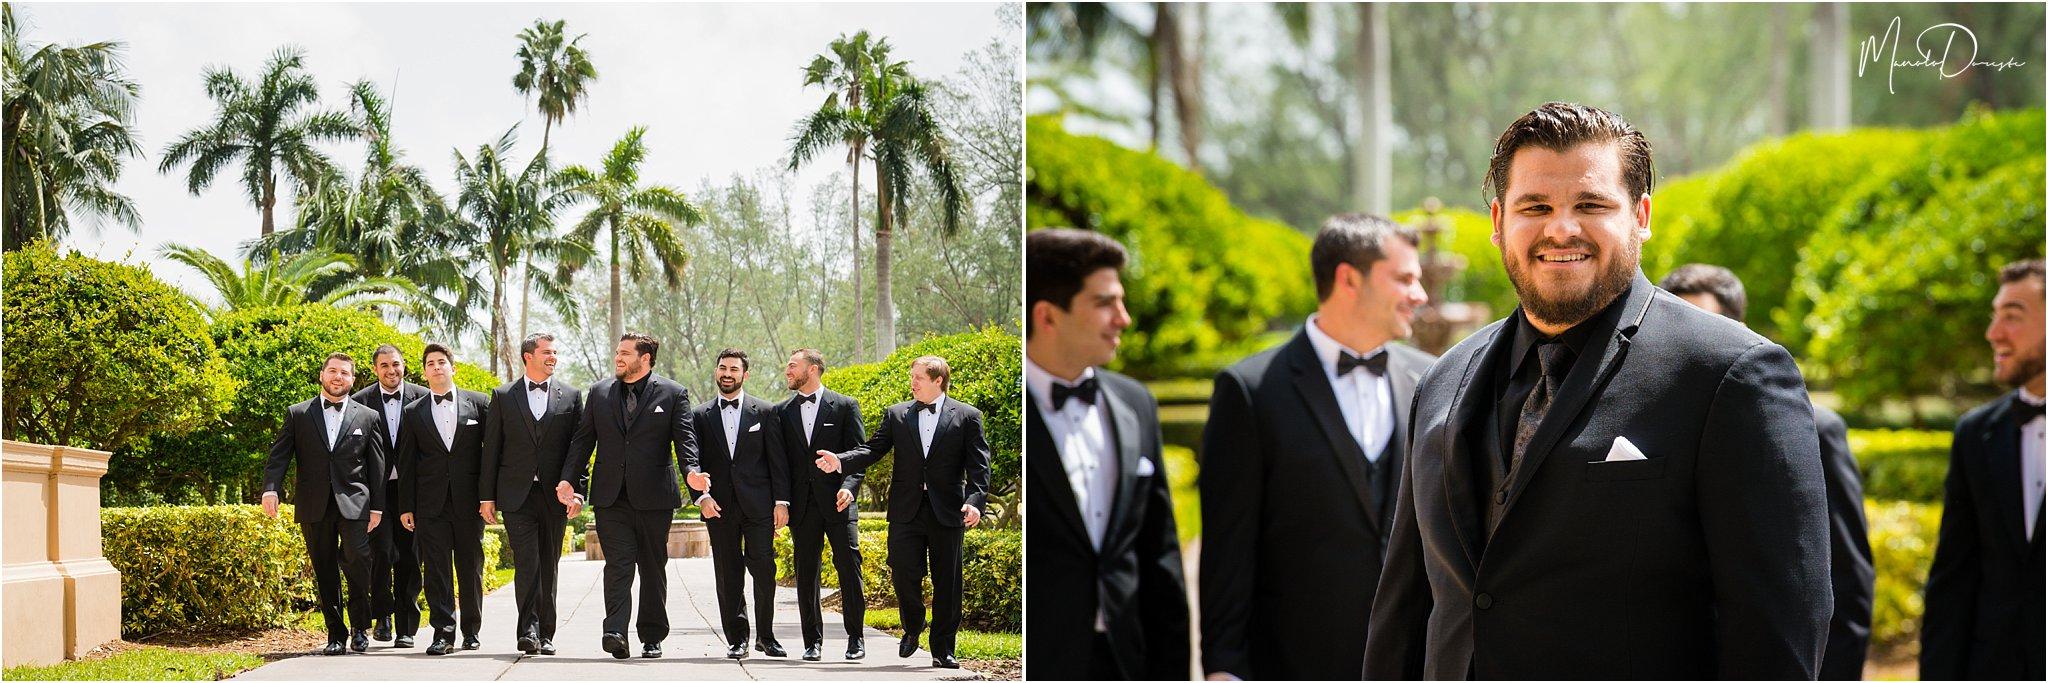 0158_ManoloDoreste_InFocusStudios_Wedding_Family_Photography_Miami_MiamiPhotographer.jpg